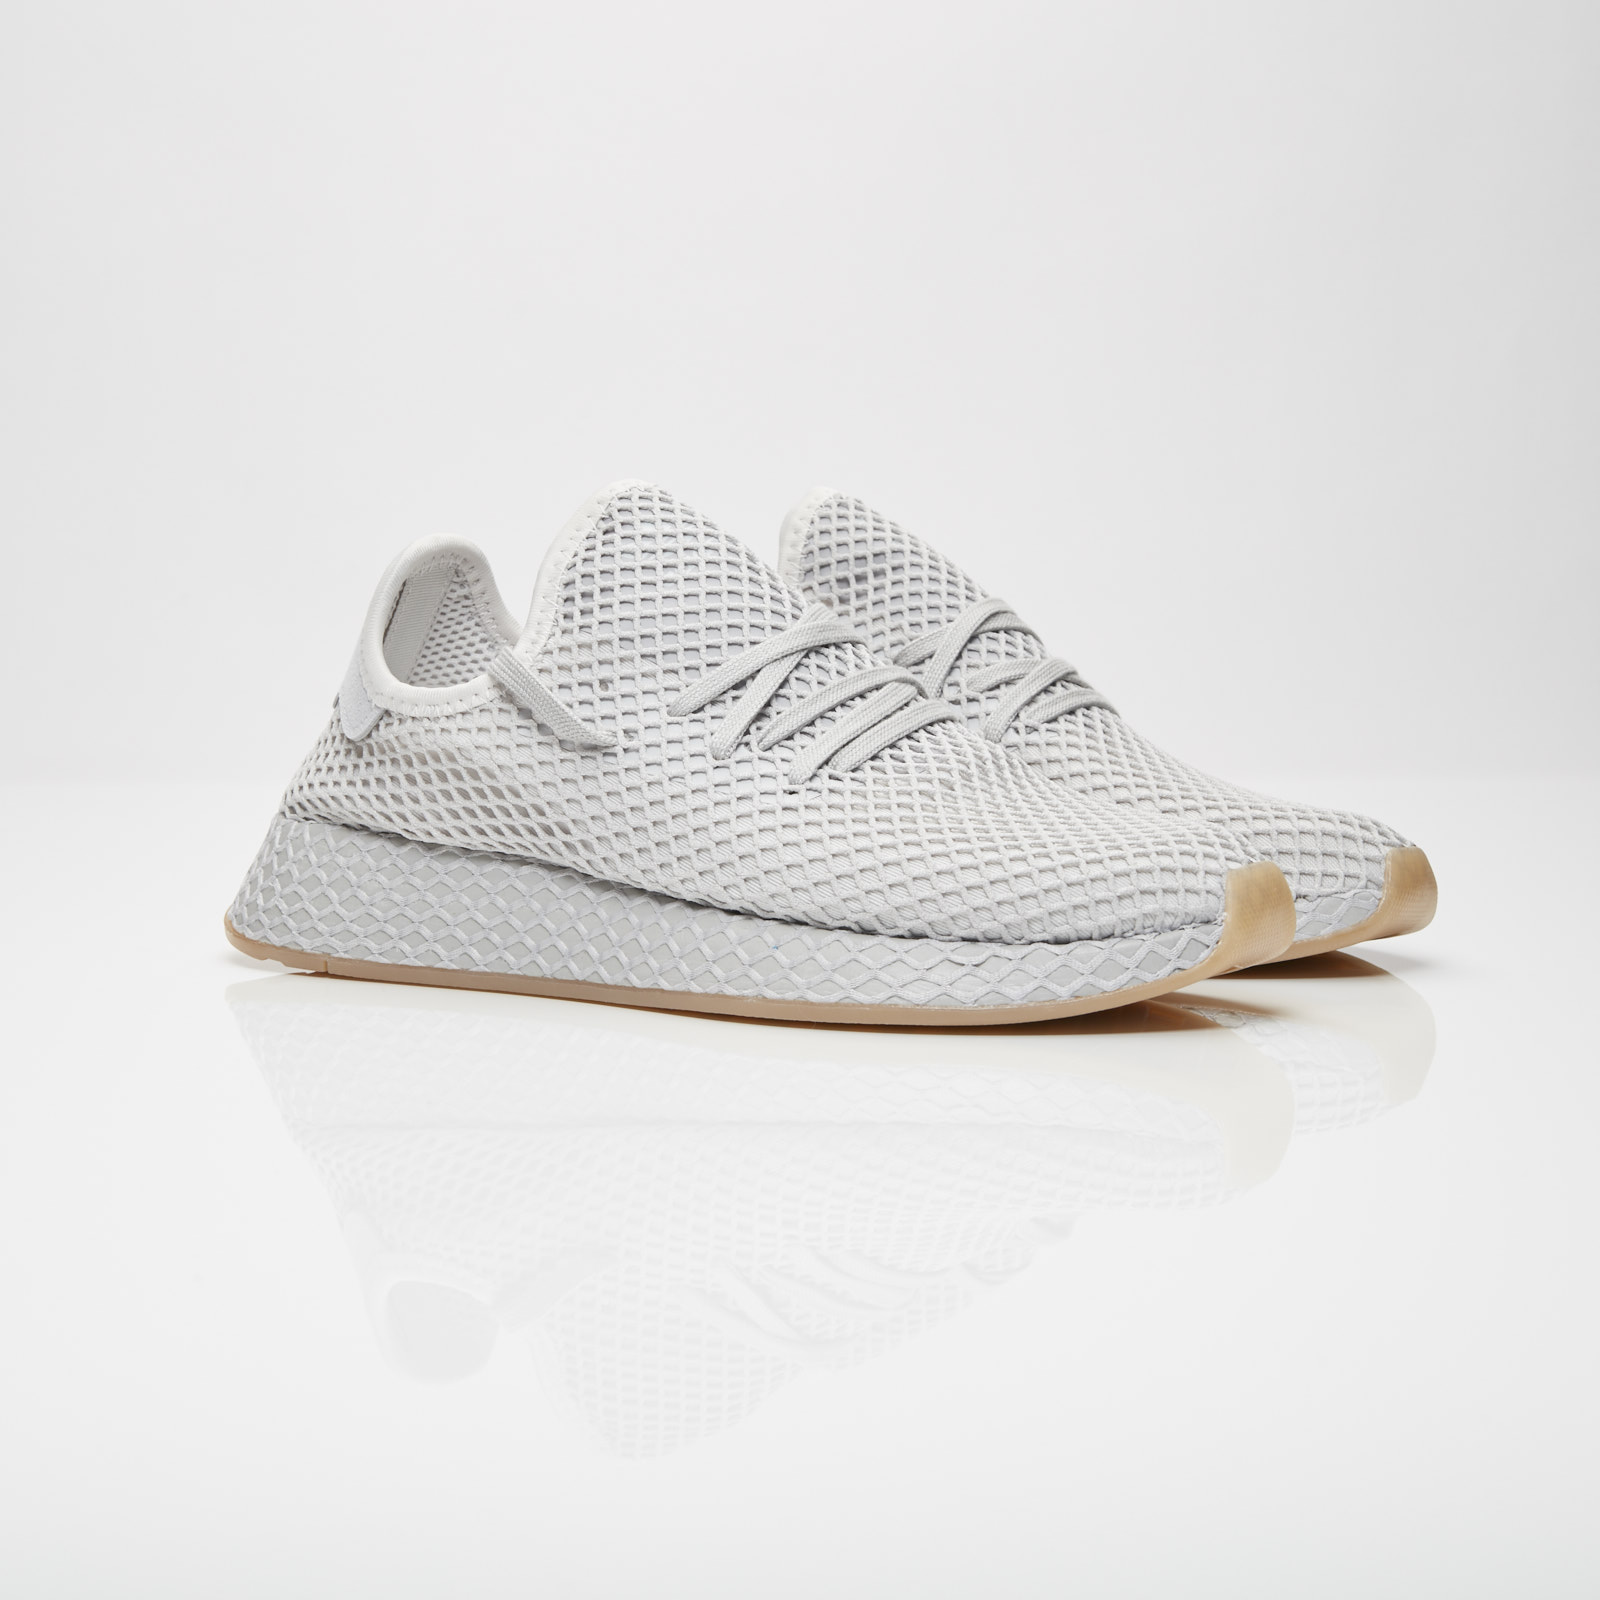 d32297b69 adidas Deerupt Runner - Cq2628 - Sneakersnstuff